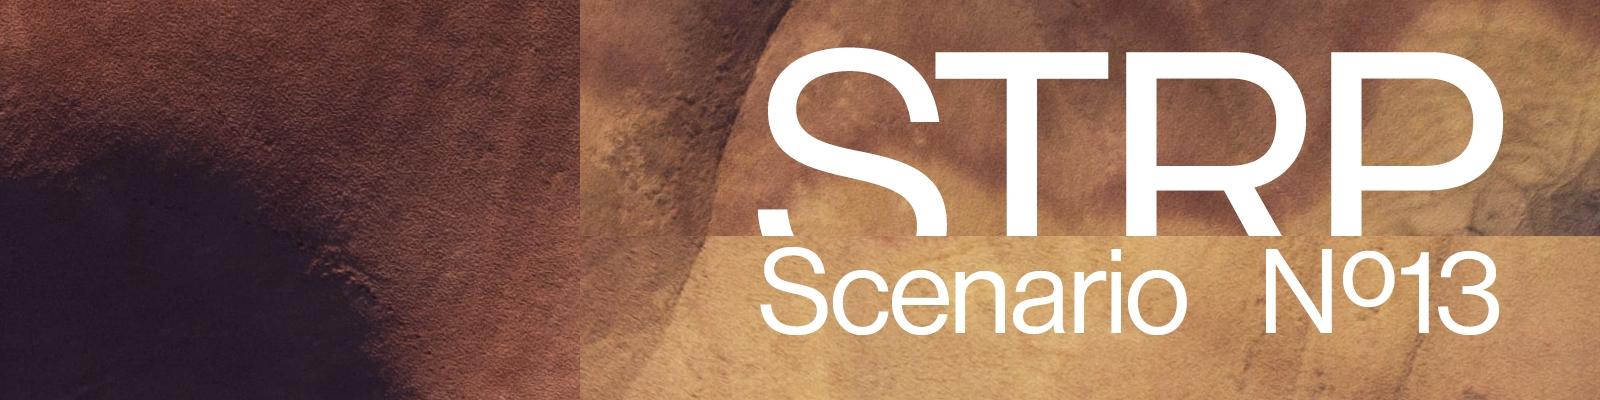 STRP 2021 Social Li Event Scenario13 1600x400